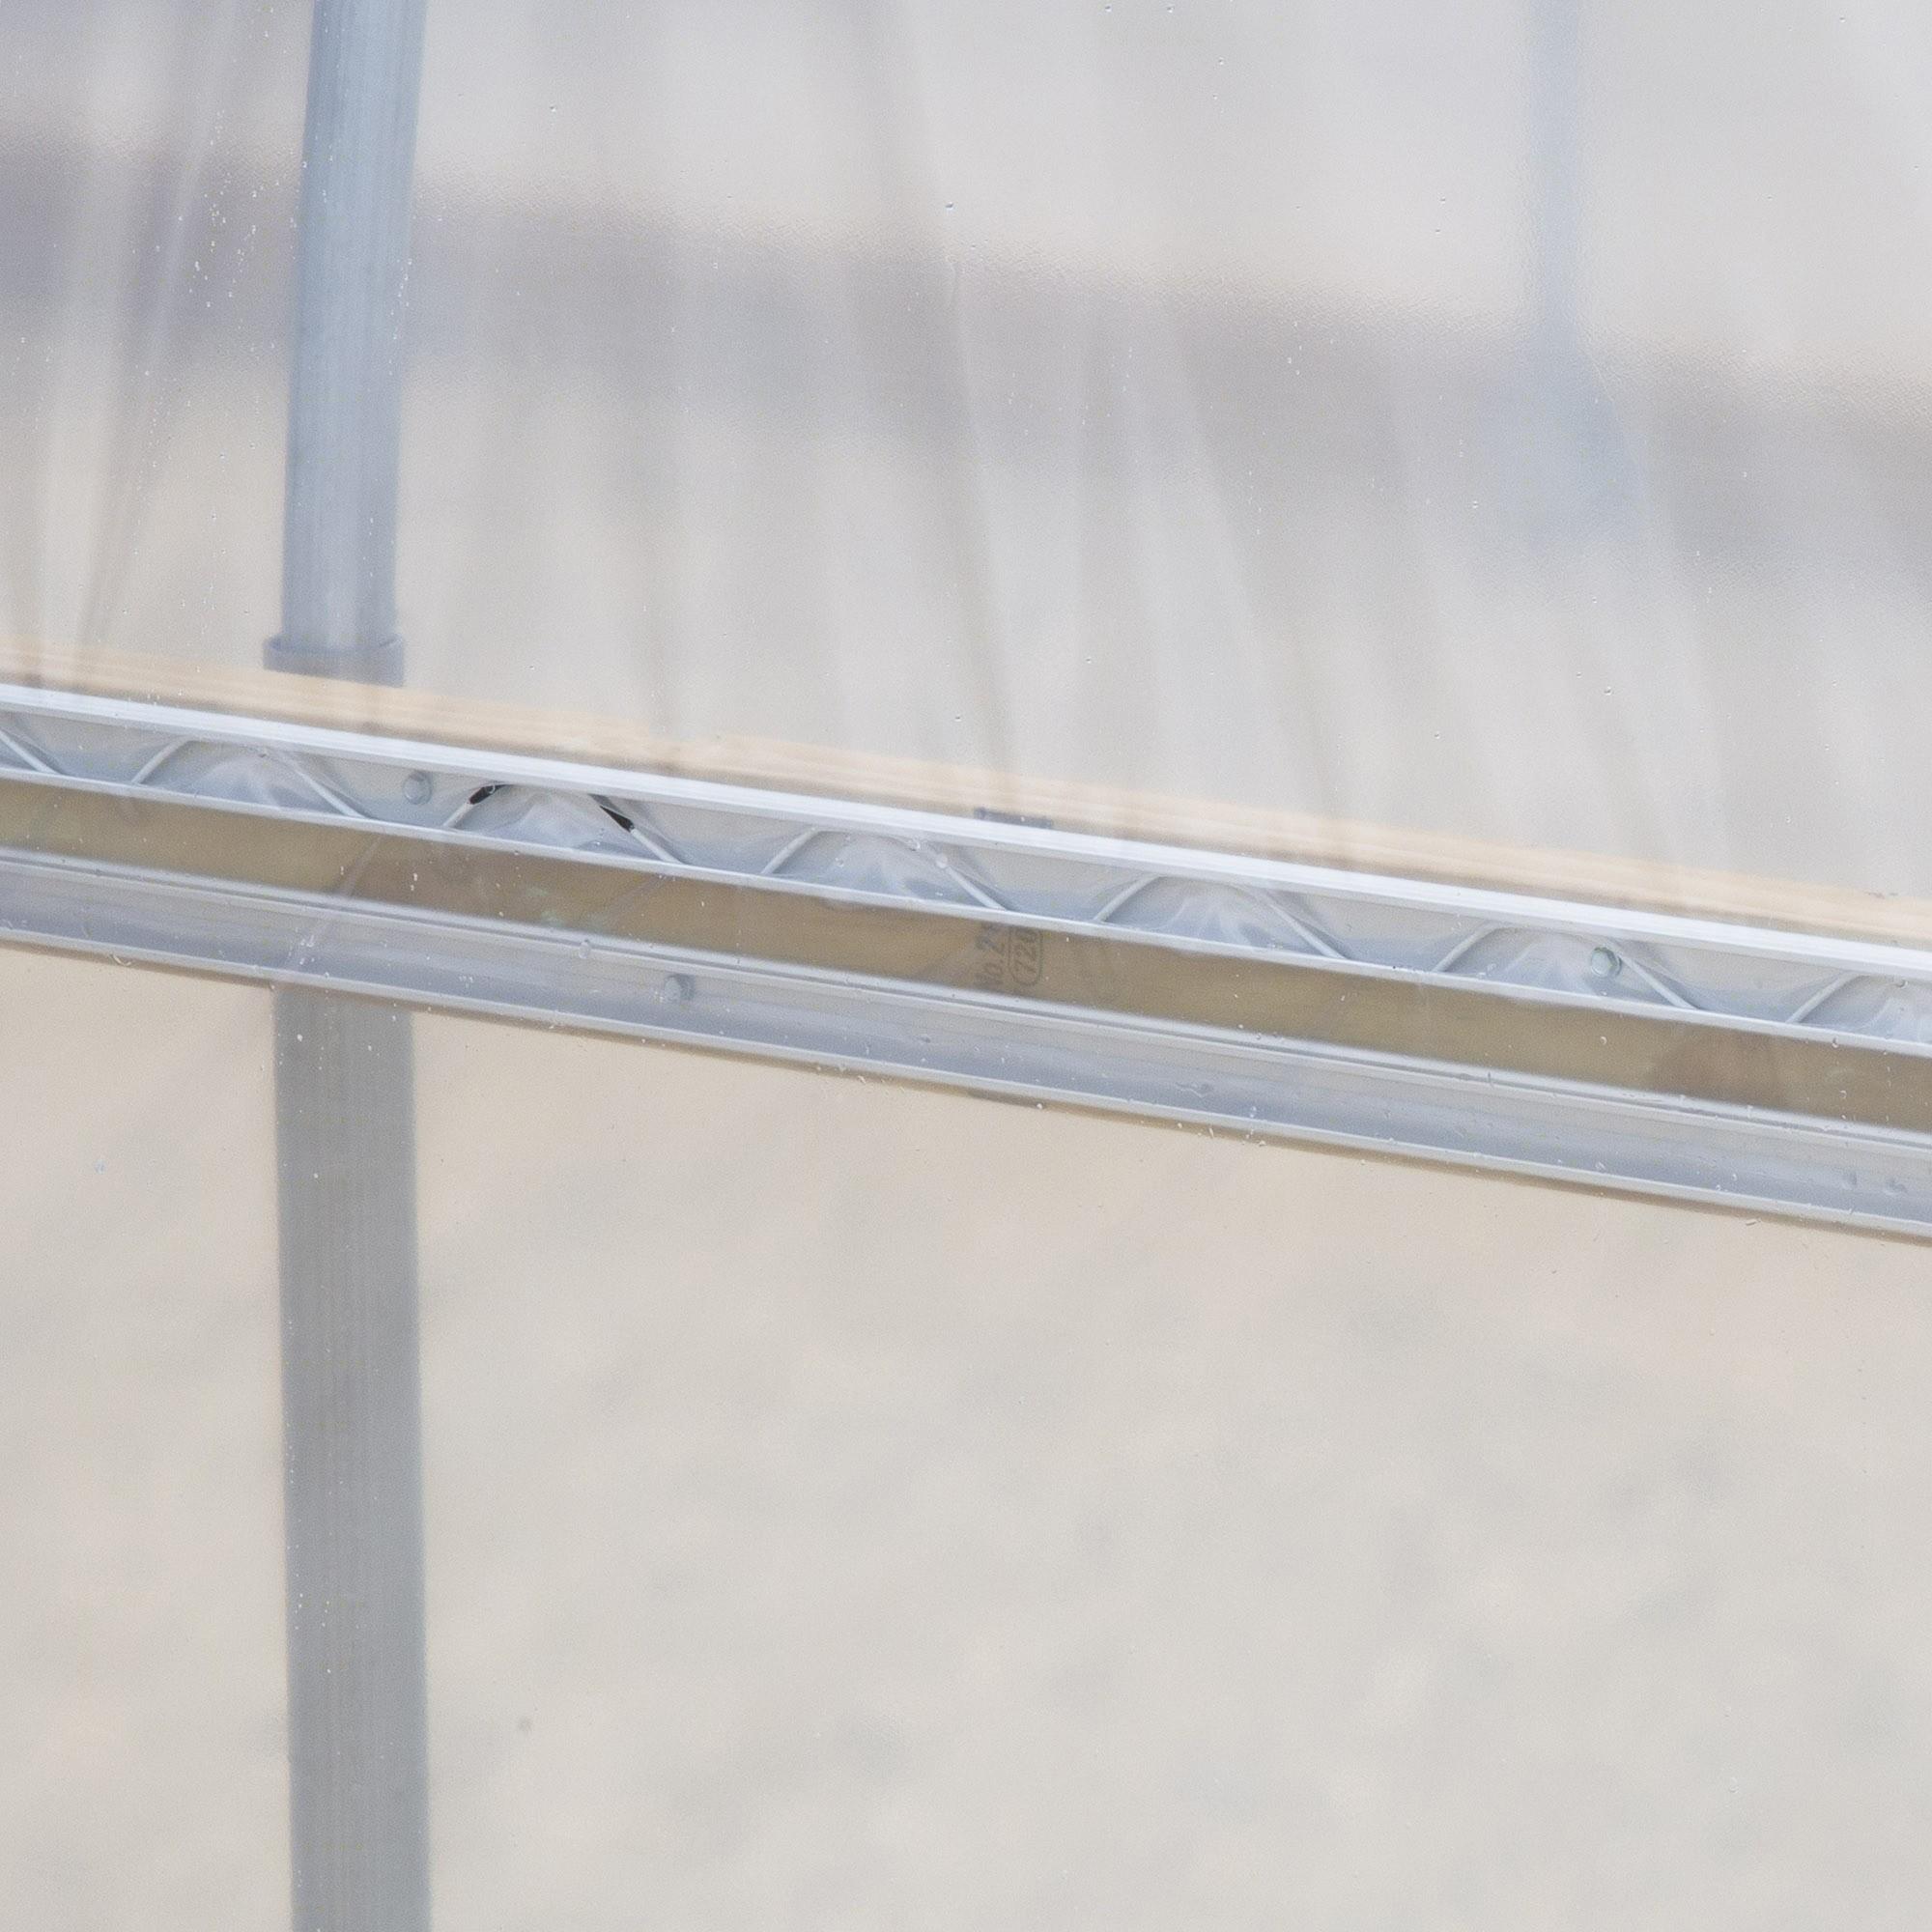 Jiggly Greenhouse® Premium Clear Plastic Greenhouse Grow Film - UVA